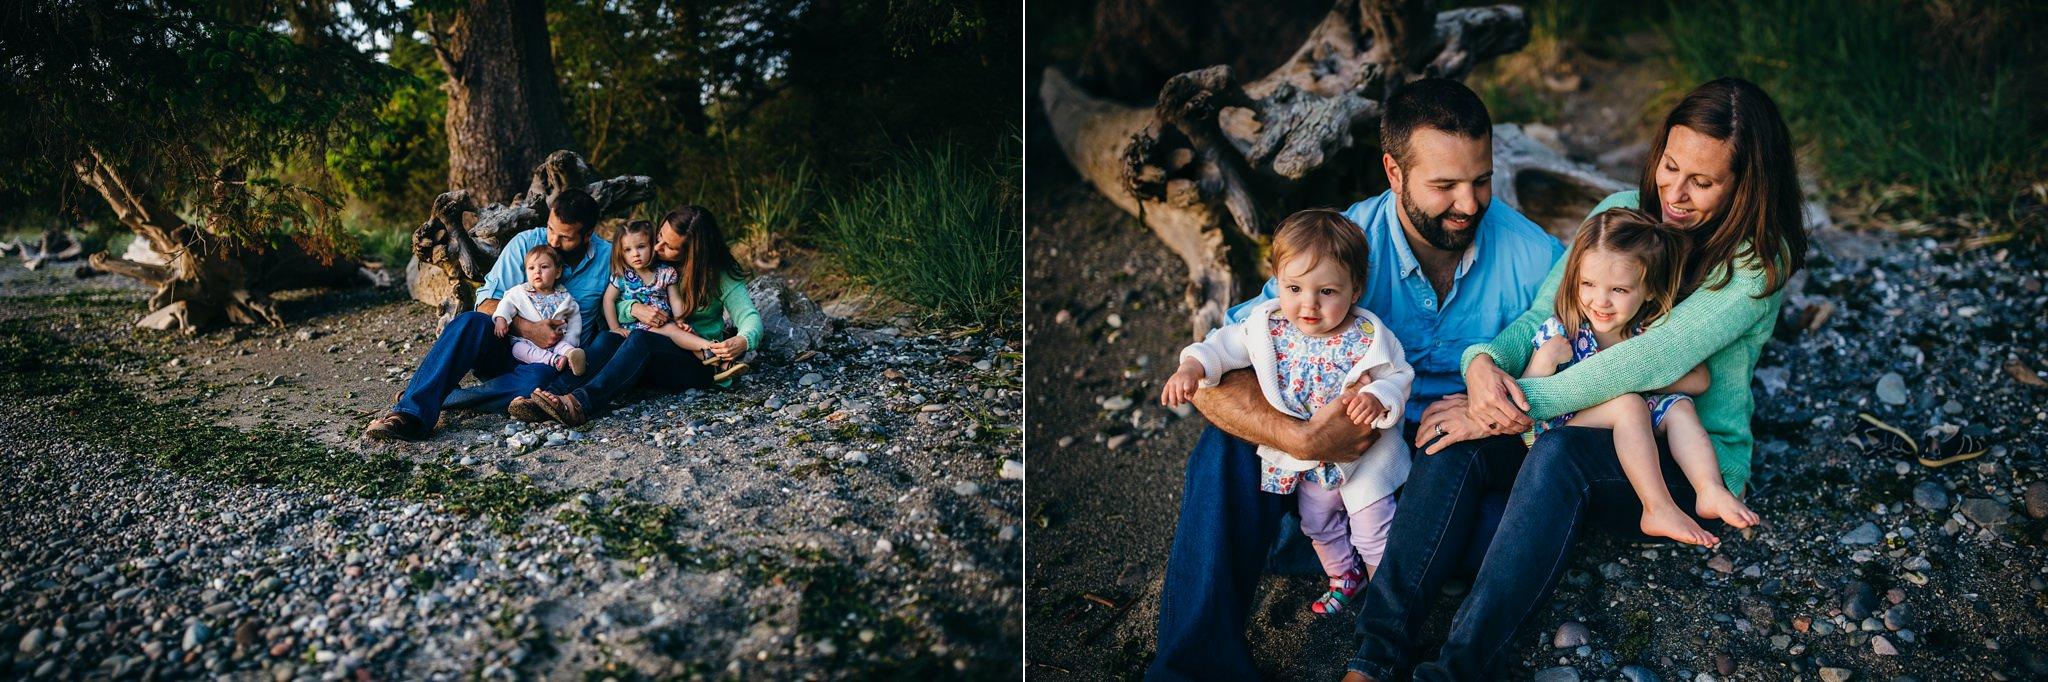 draskovic-family-whidbey-island-photographer_0049.jpg